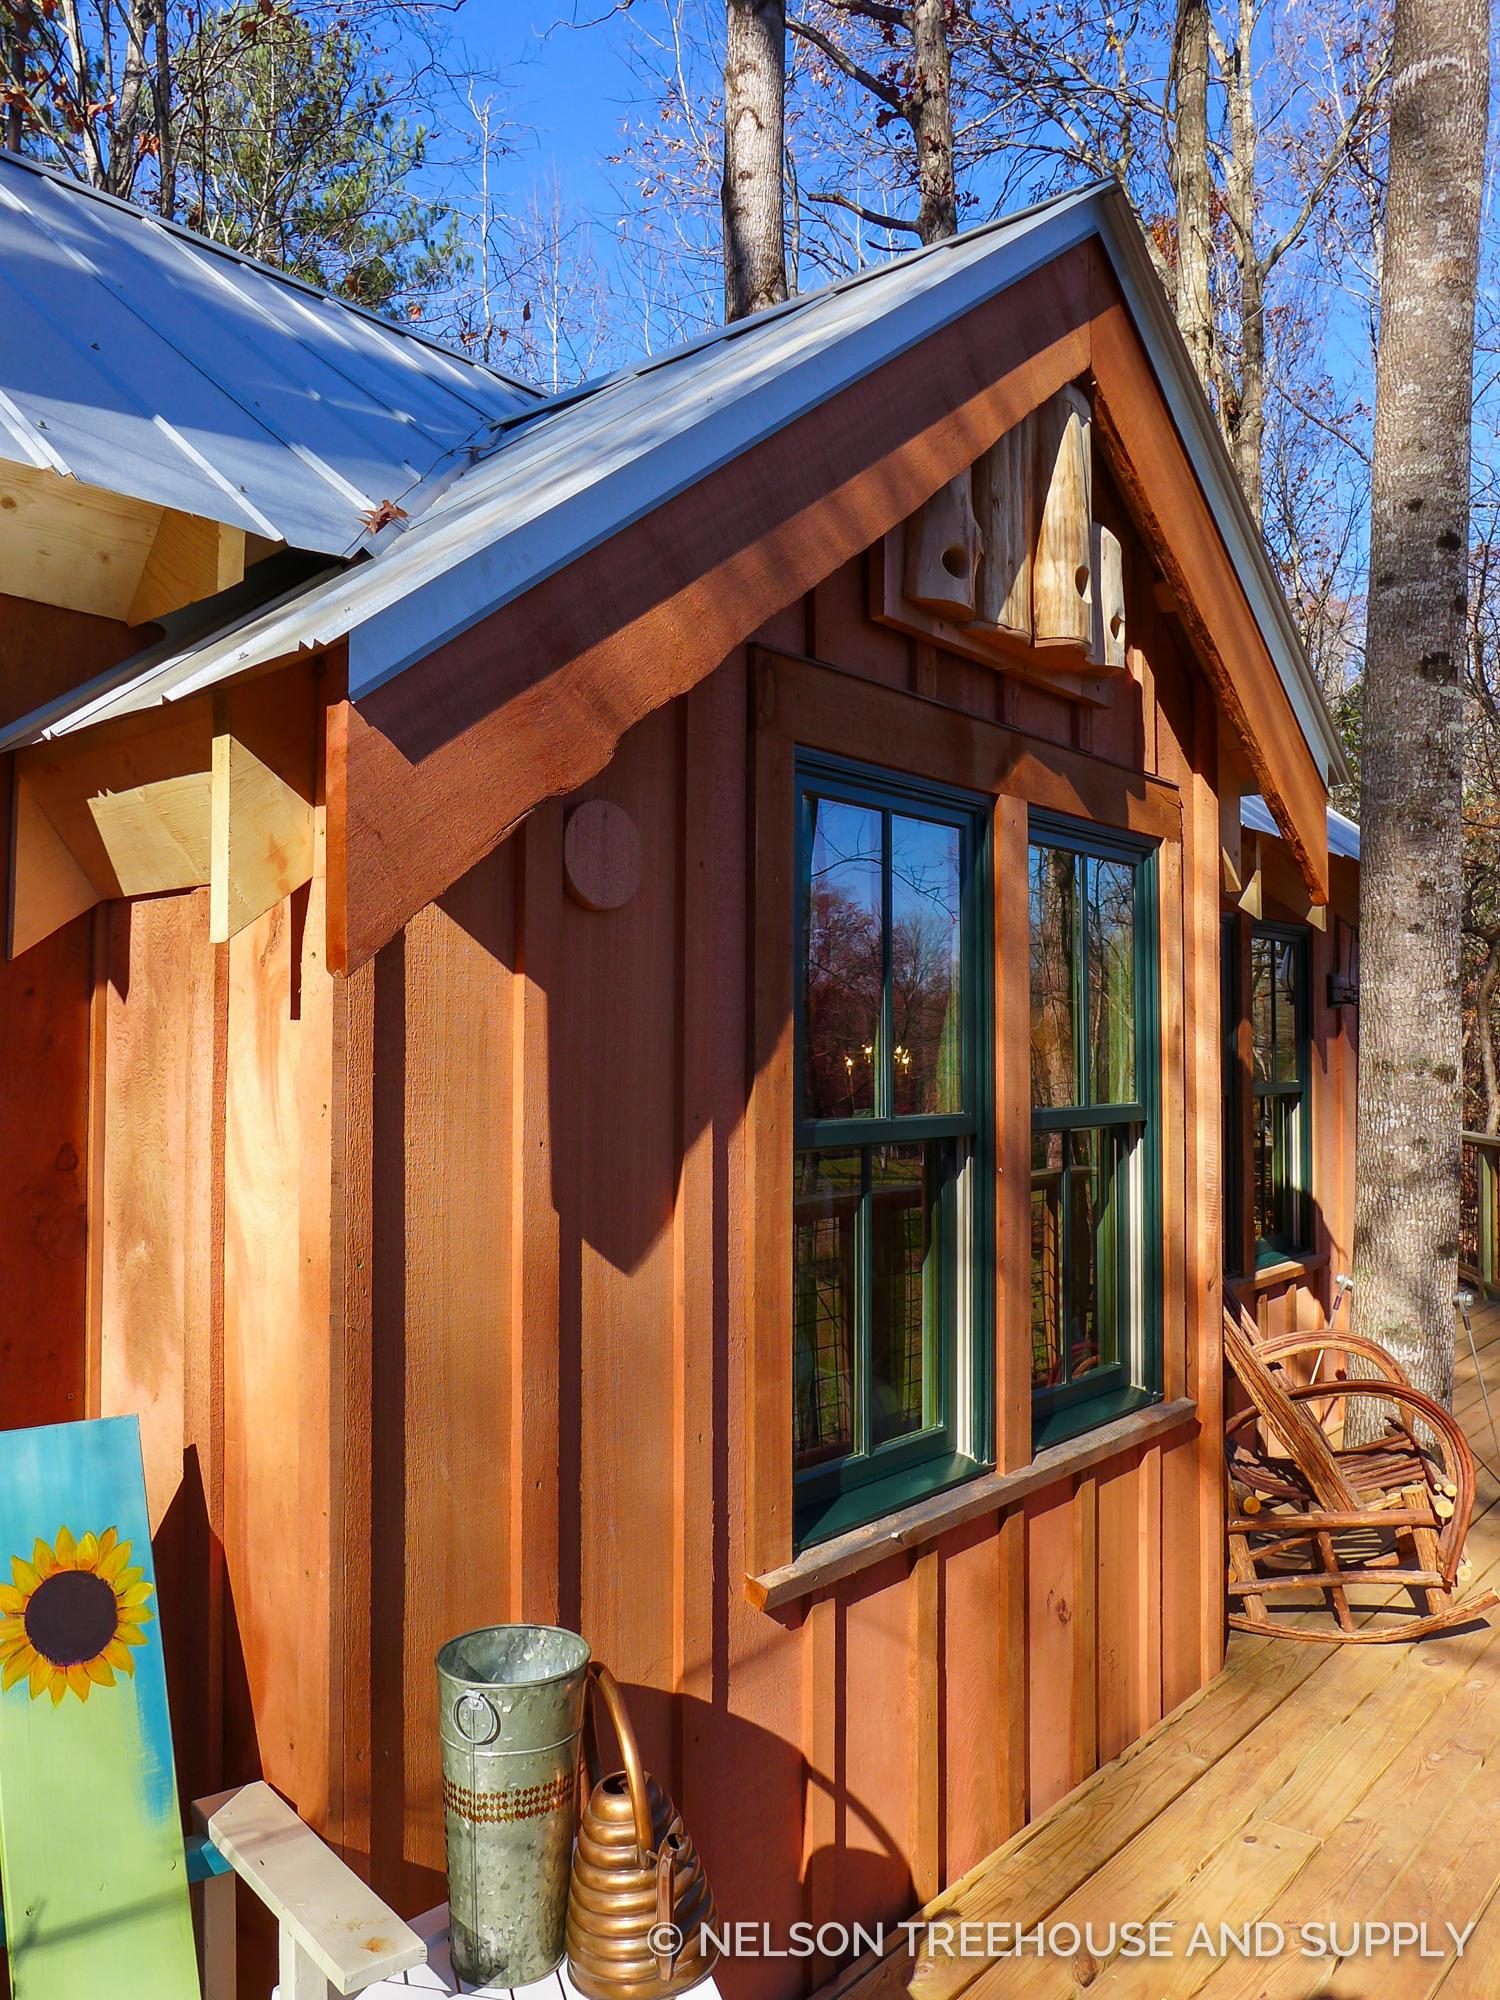 Storybook Farm Nelson Treehouse